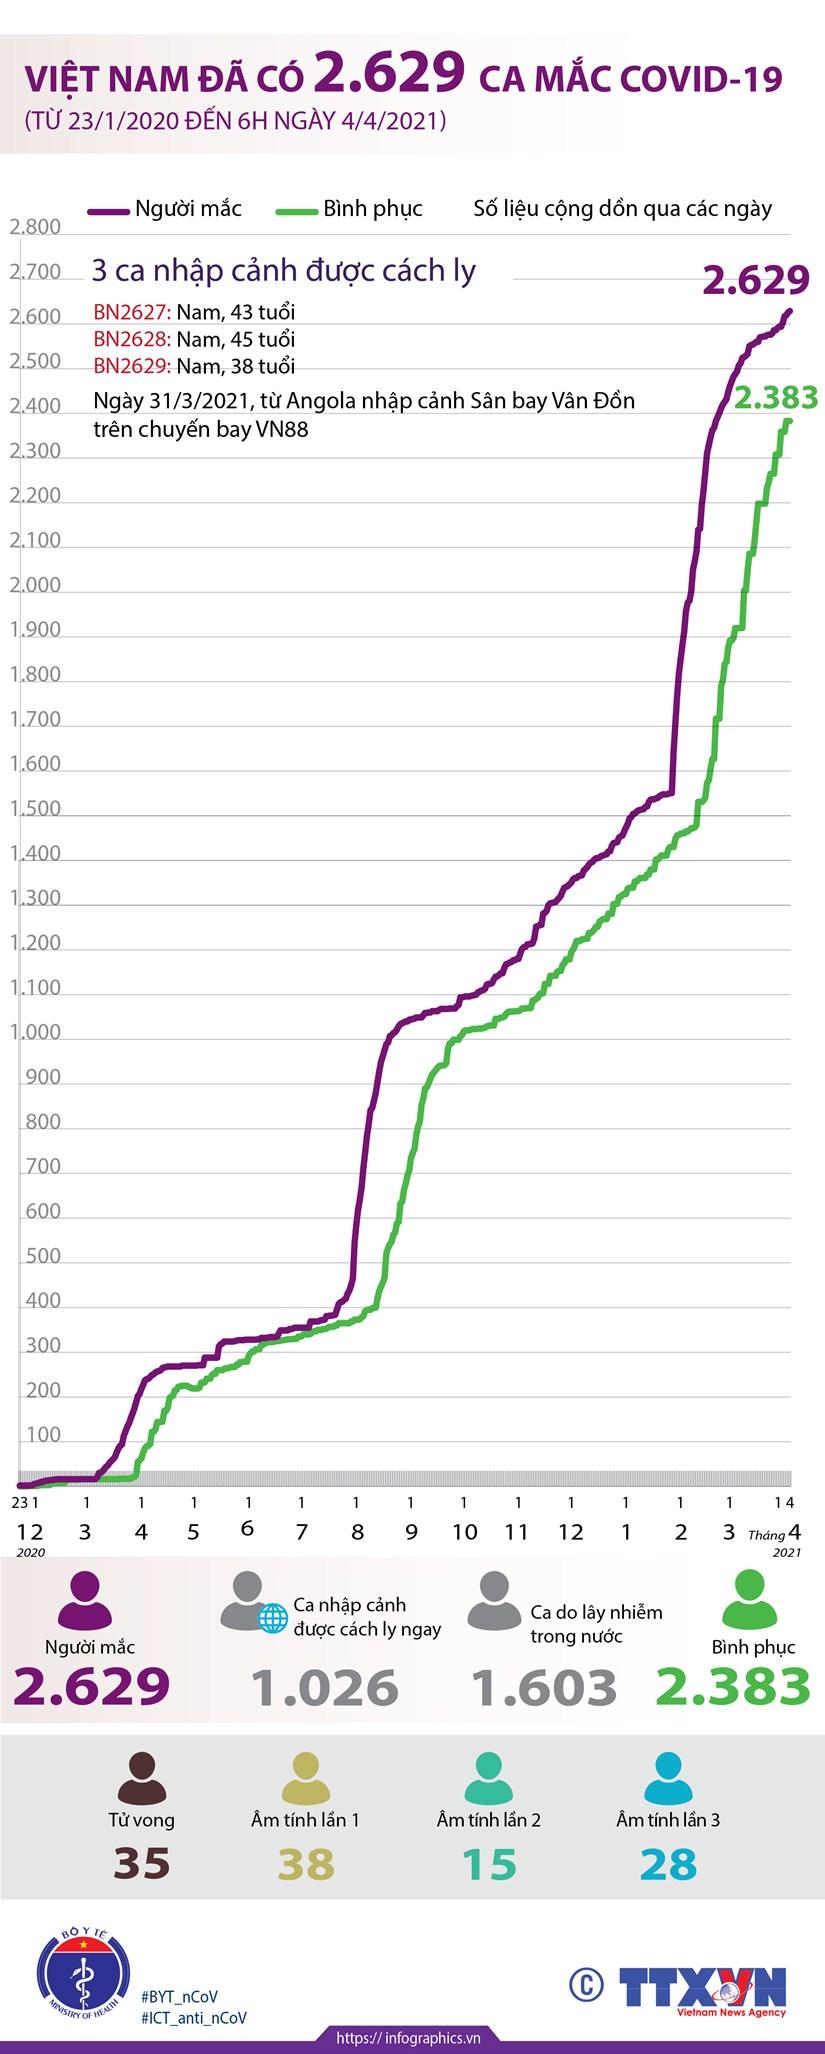 [Infographics] Viet Nam da ghi nhan 2.629 ca mac COVID-19 hinh anh 1